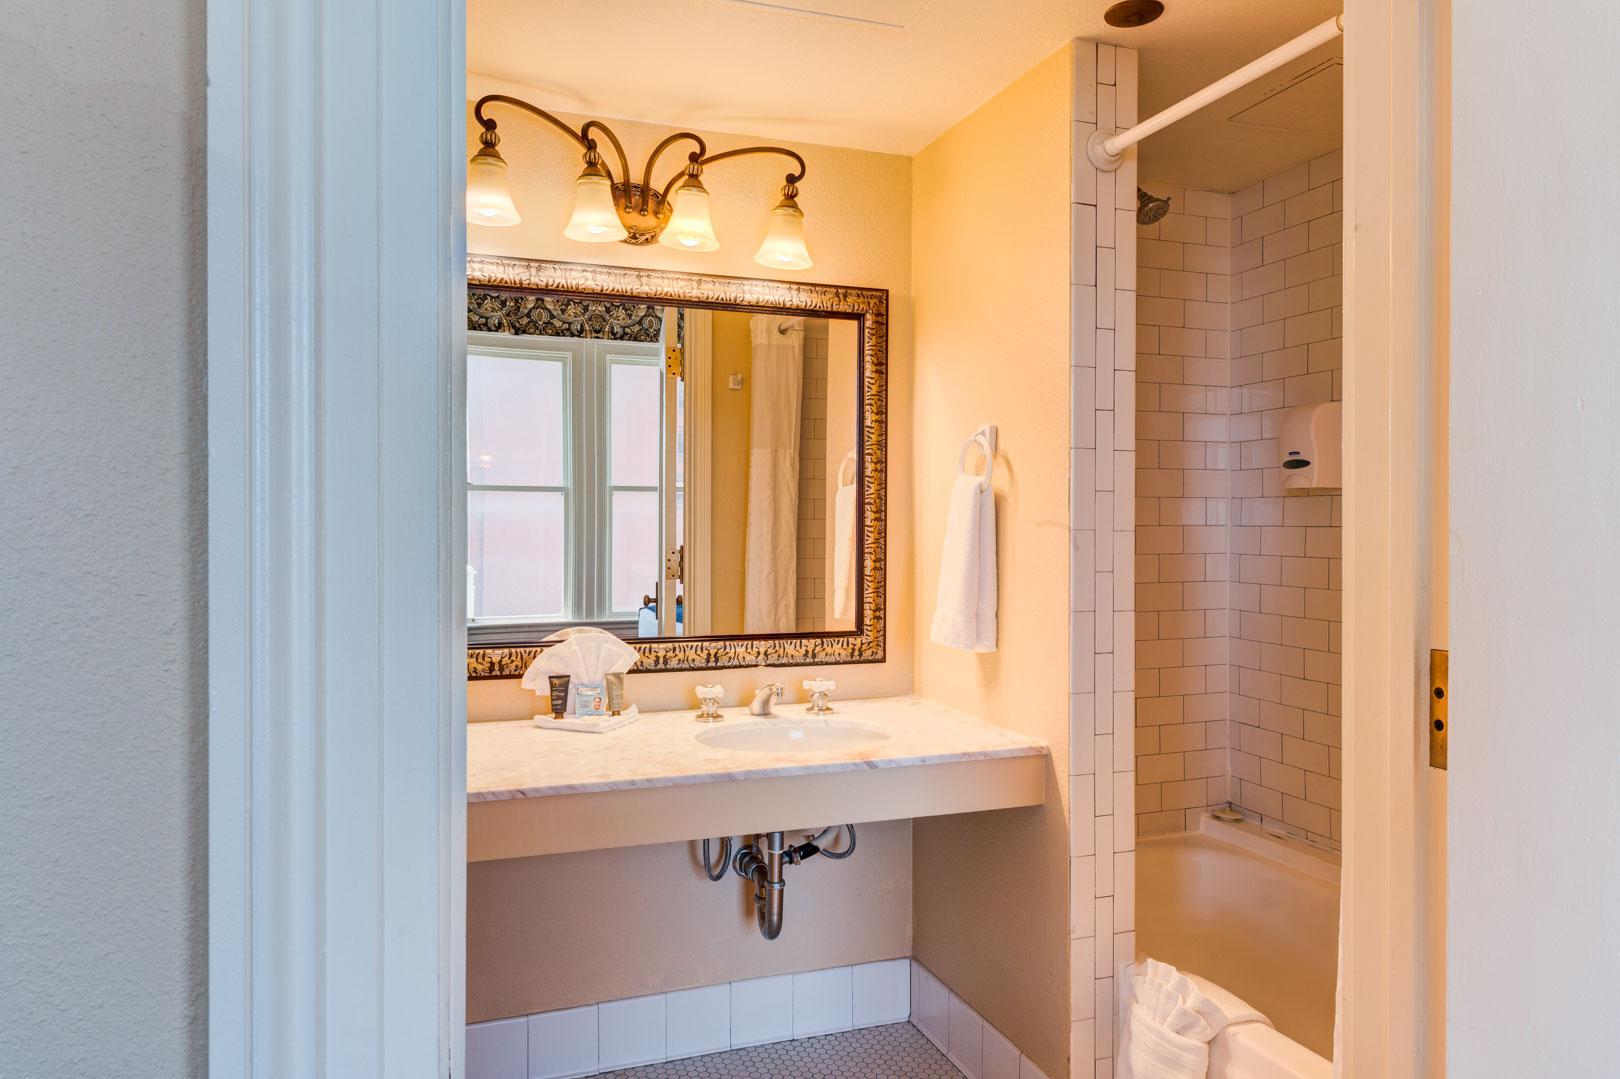 A clean bathroom at VRI's Gaslamp Plaza Suites in San Diego, California.